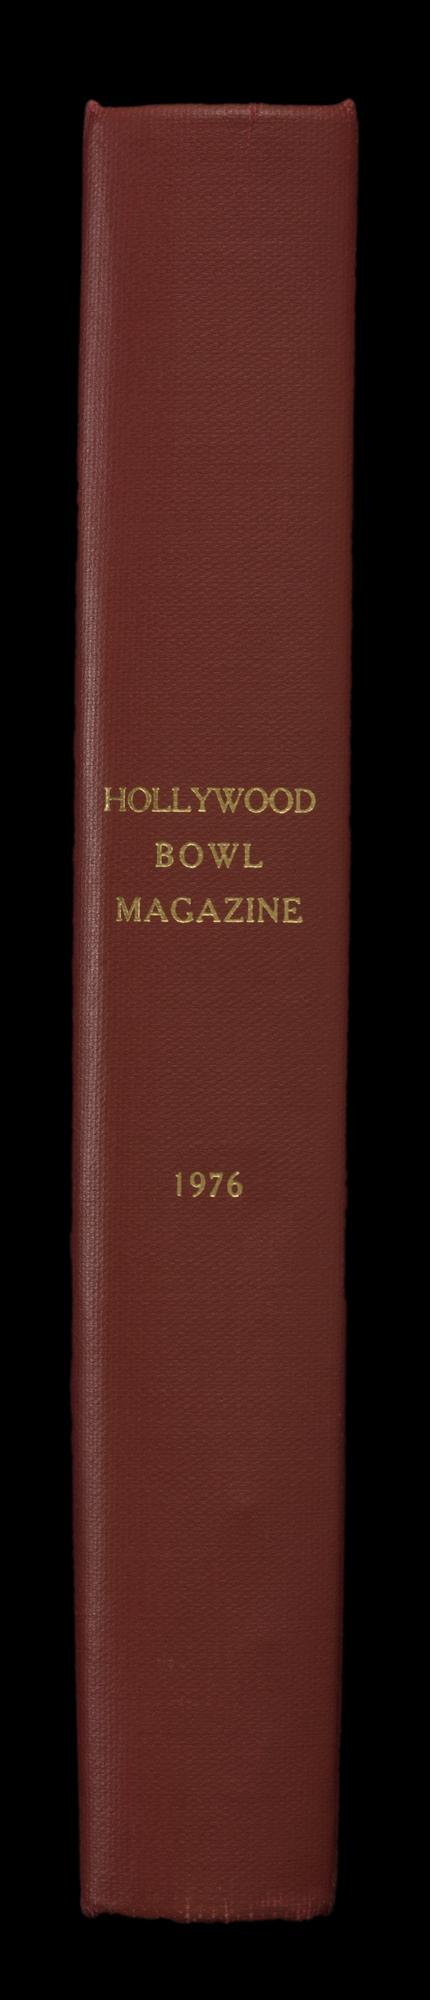 HB_ProgramBook_Spine_1976.jpg